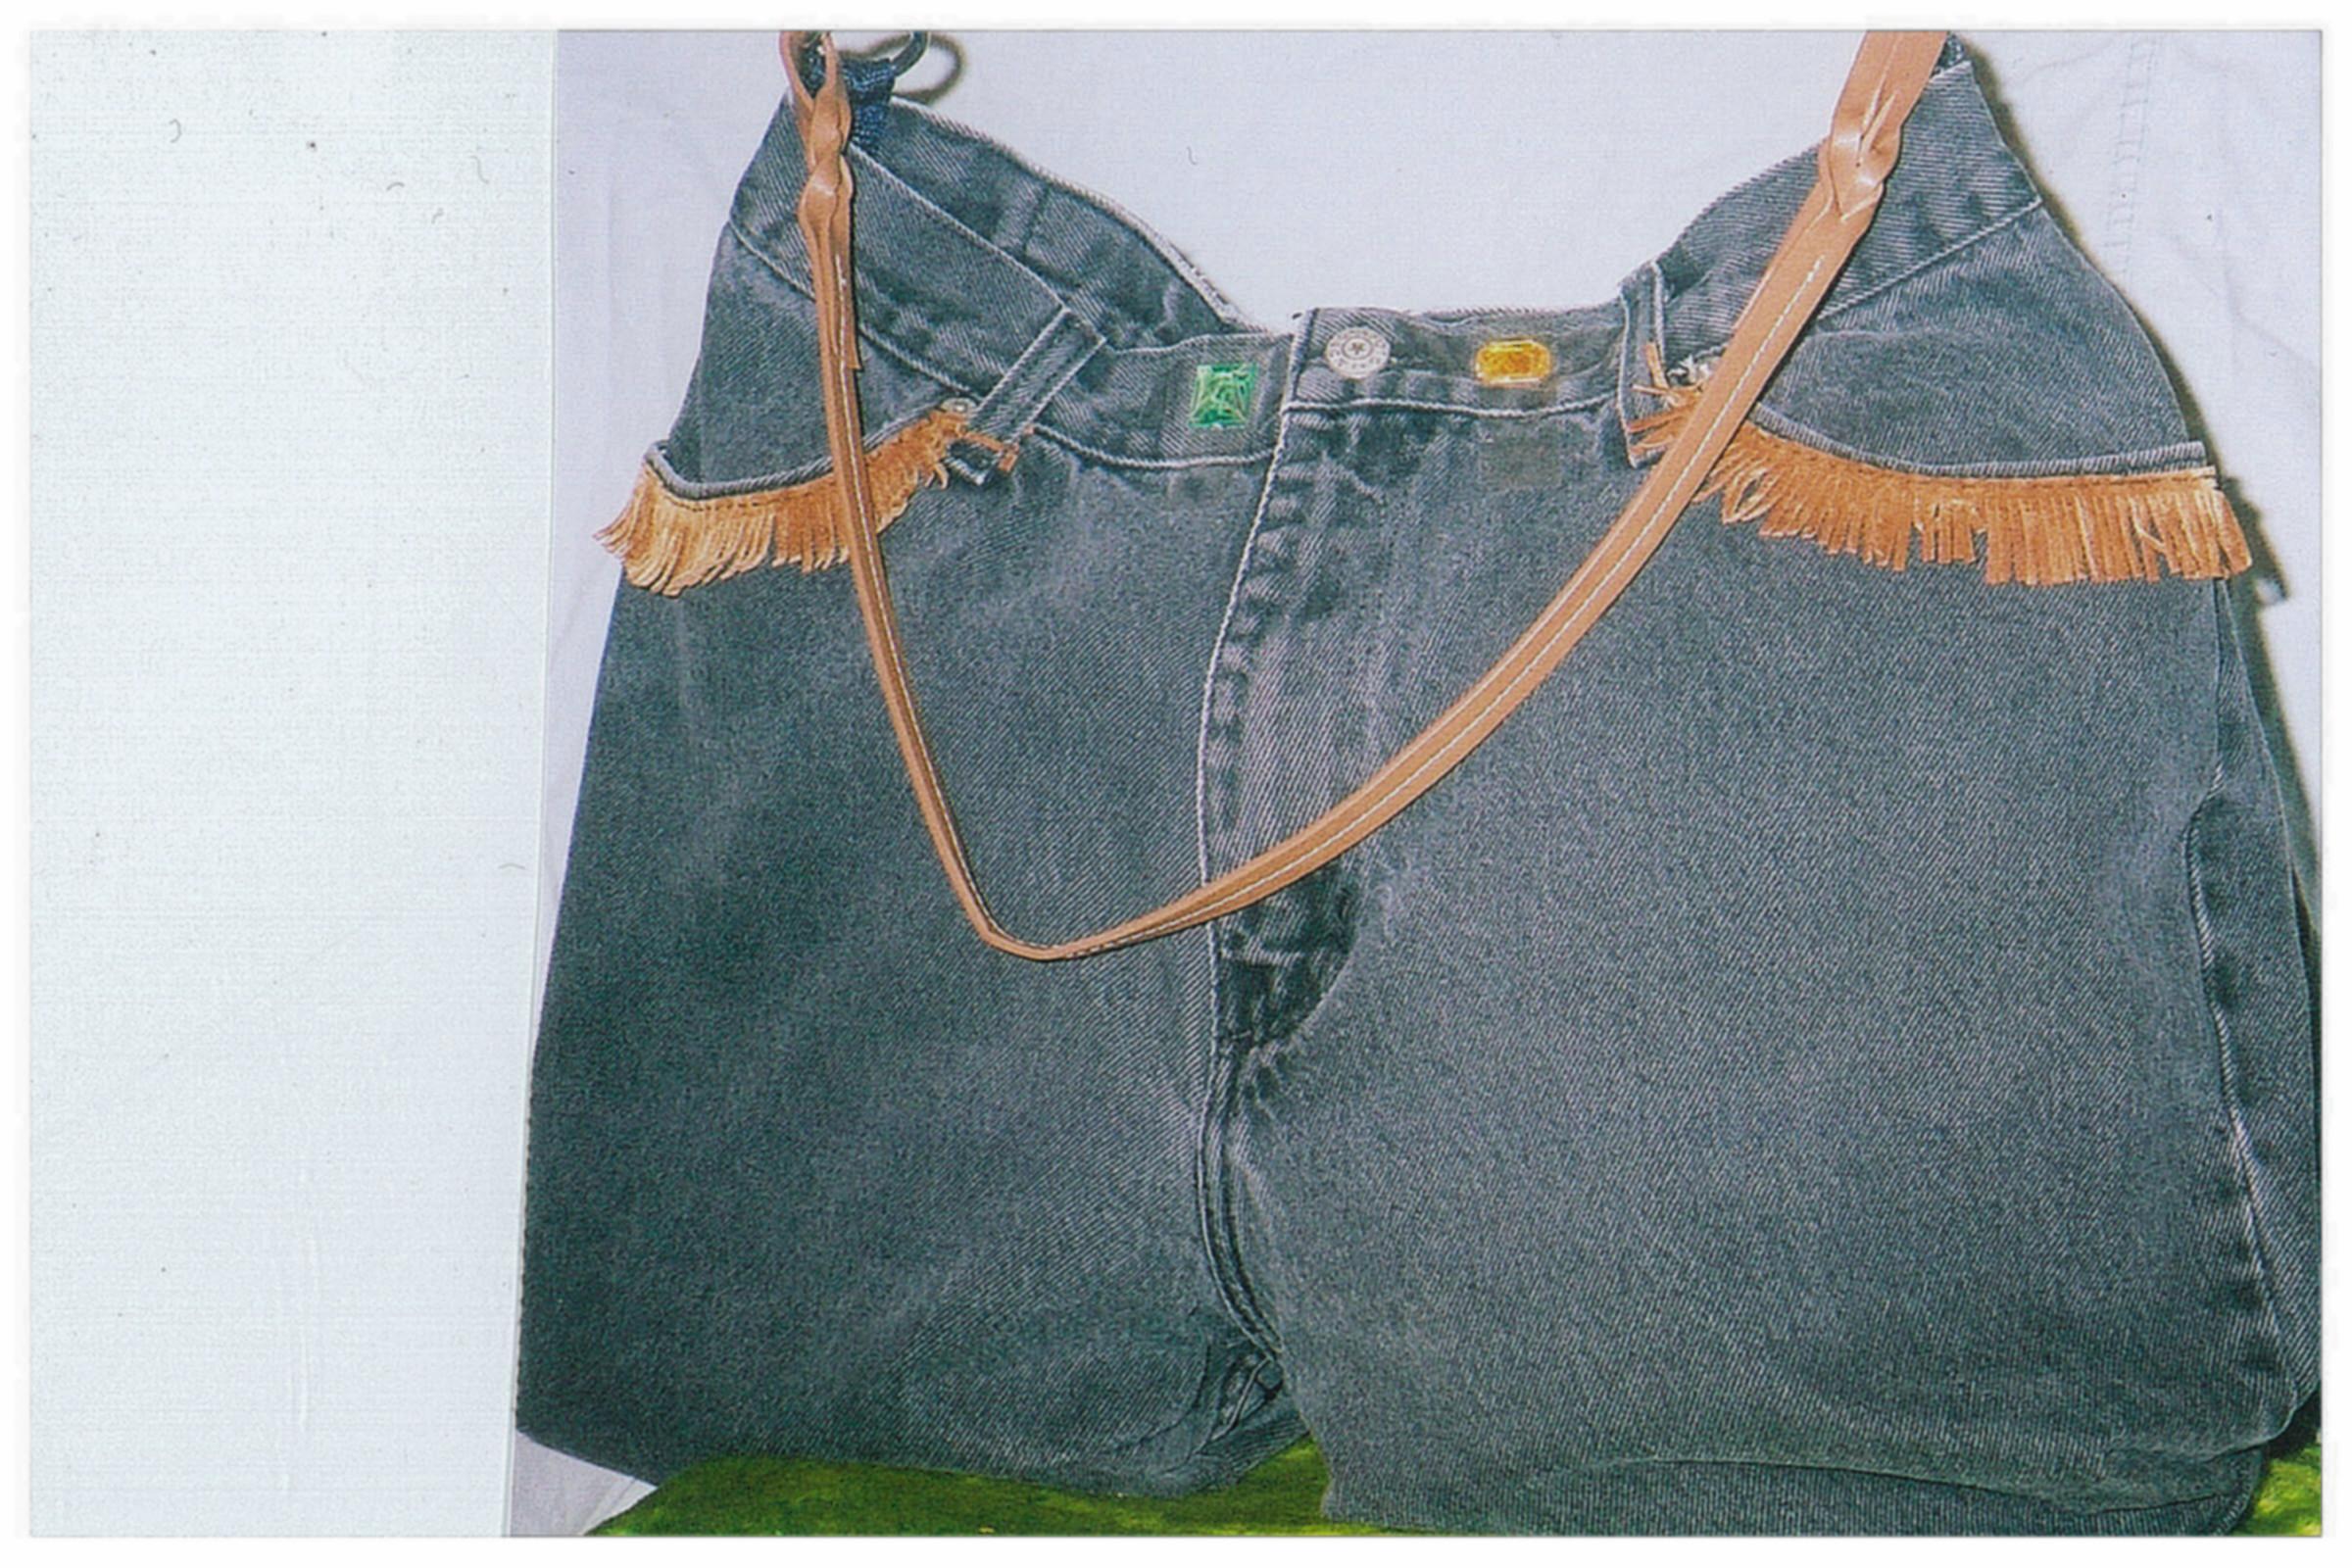 magda's bags